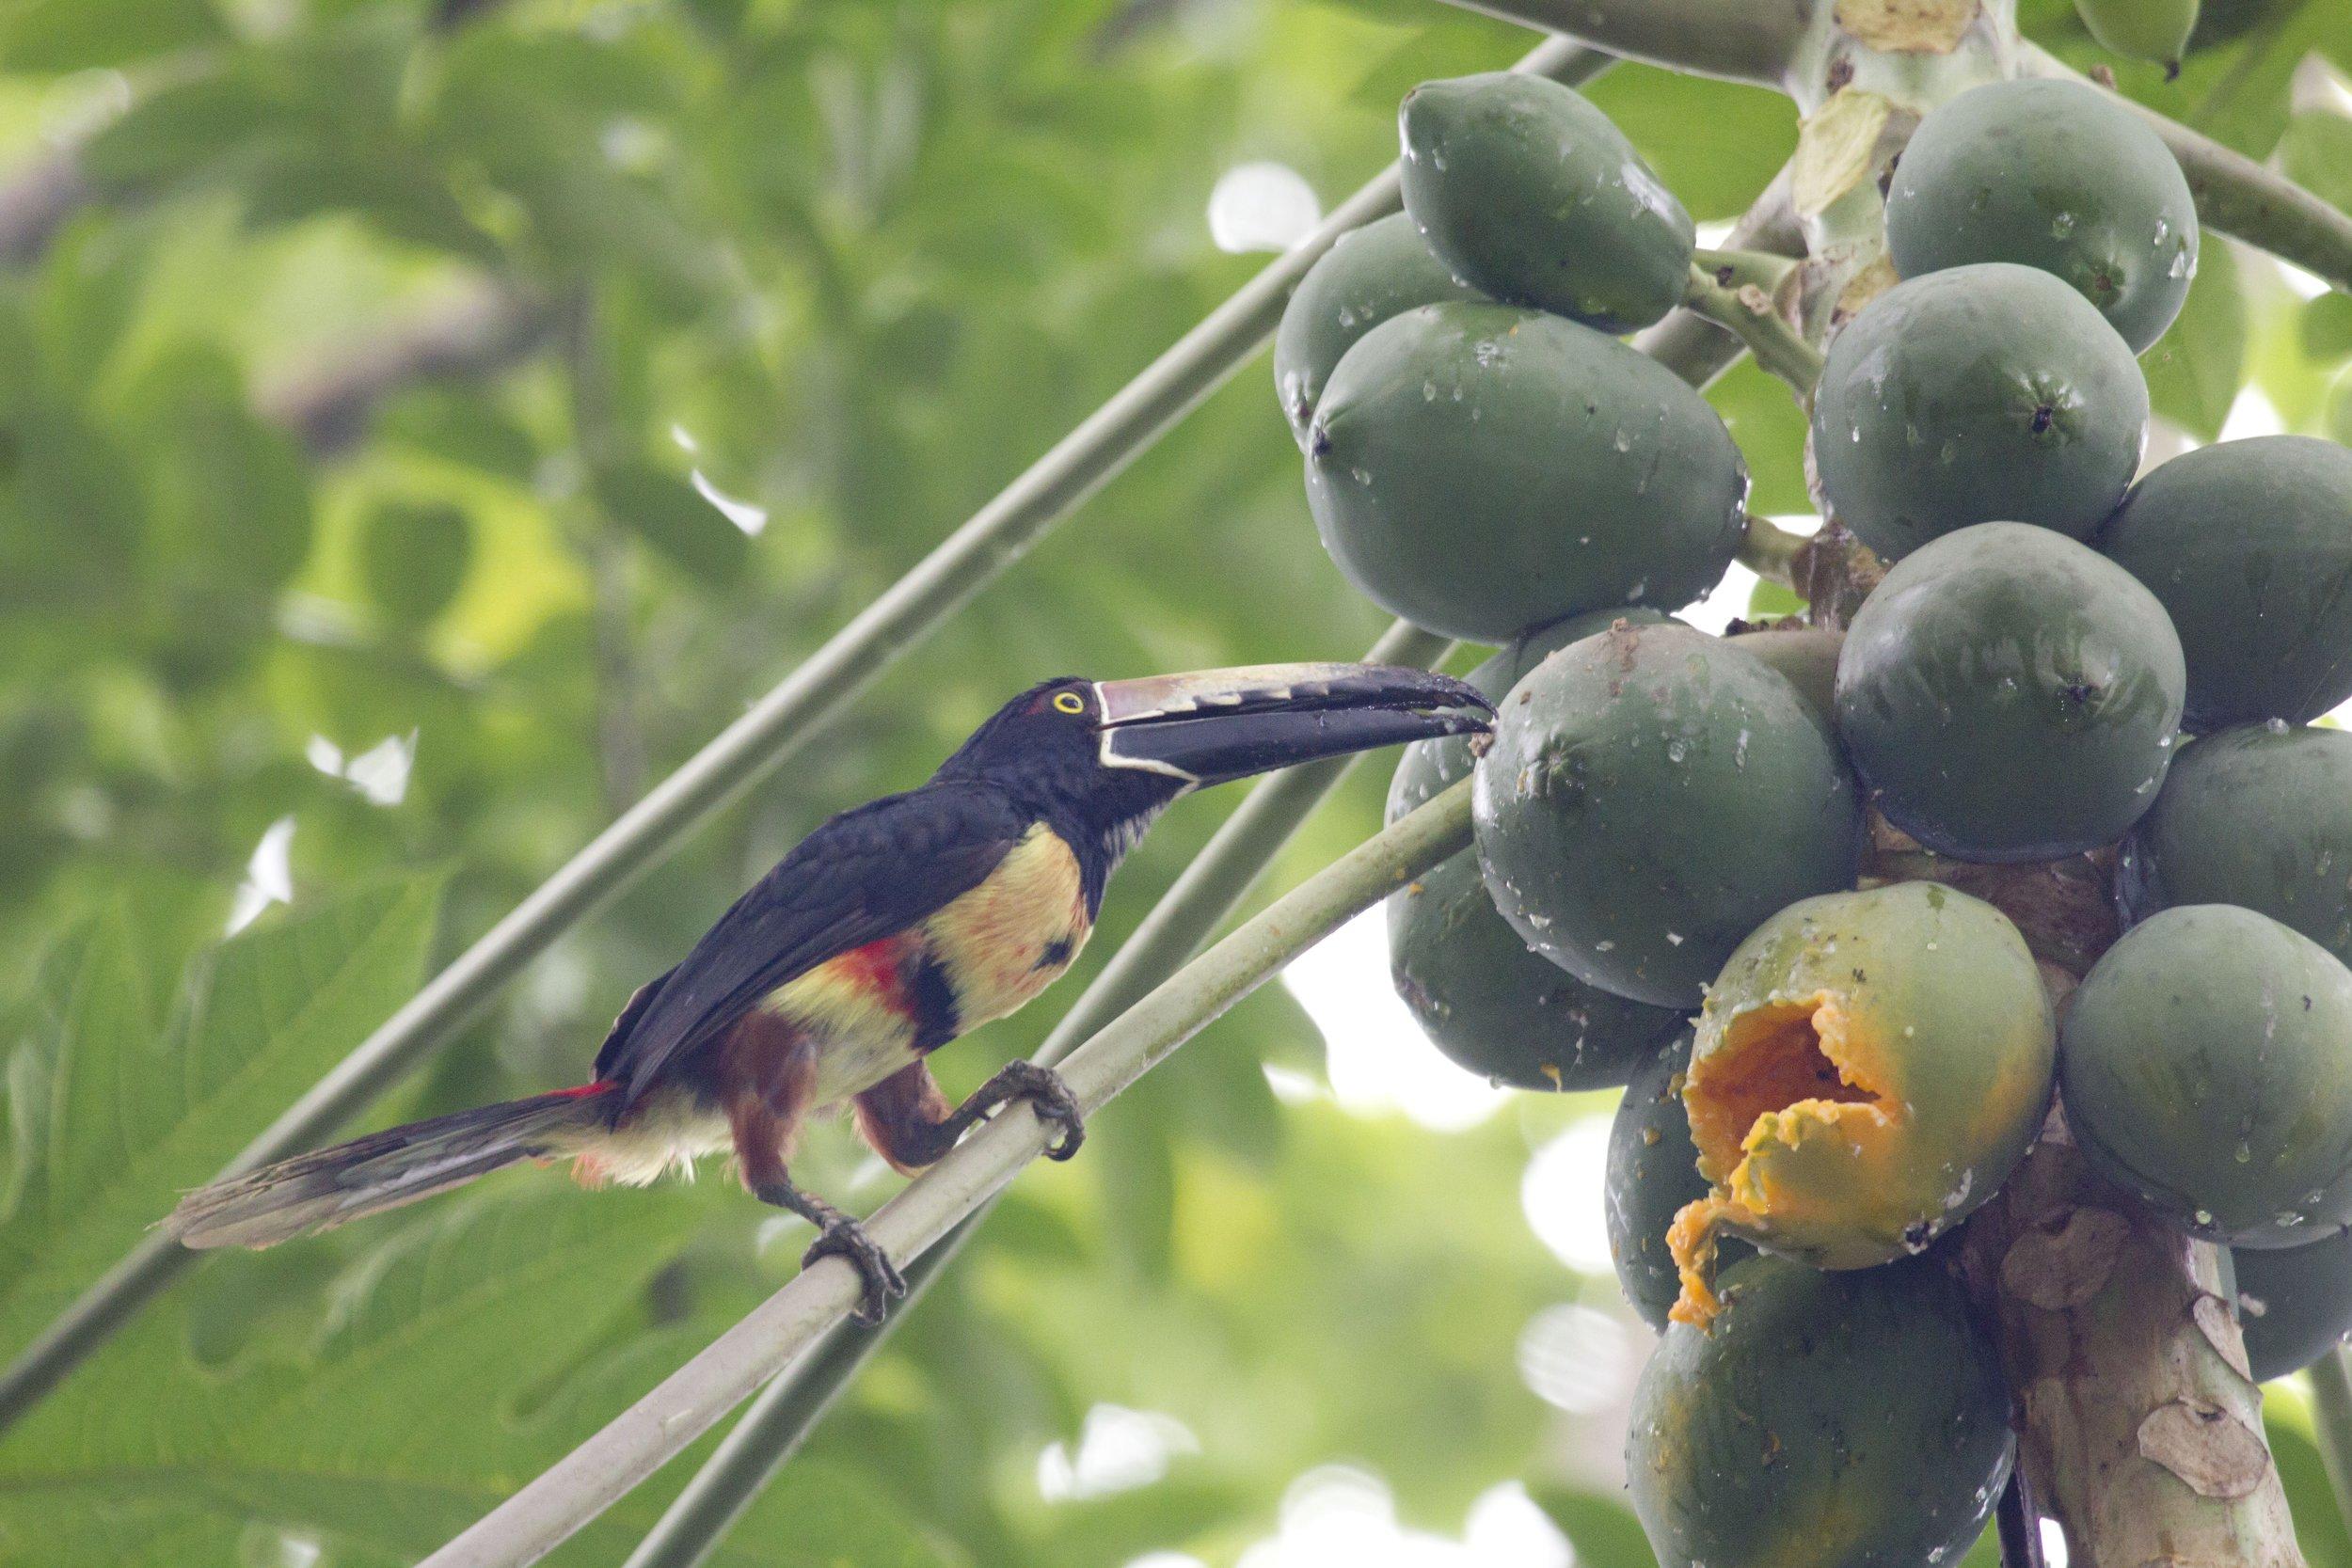 Aracari feeding on papaya